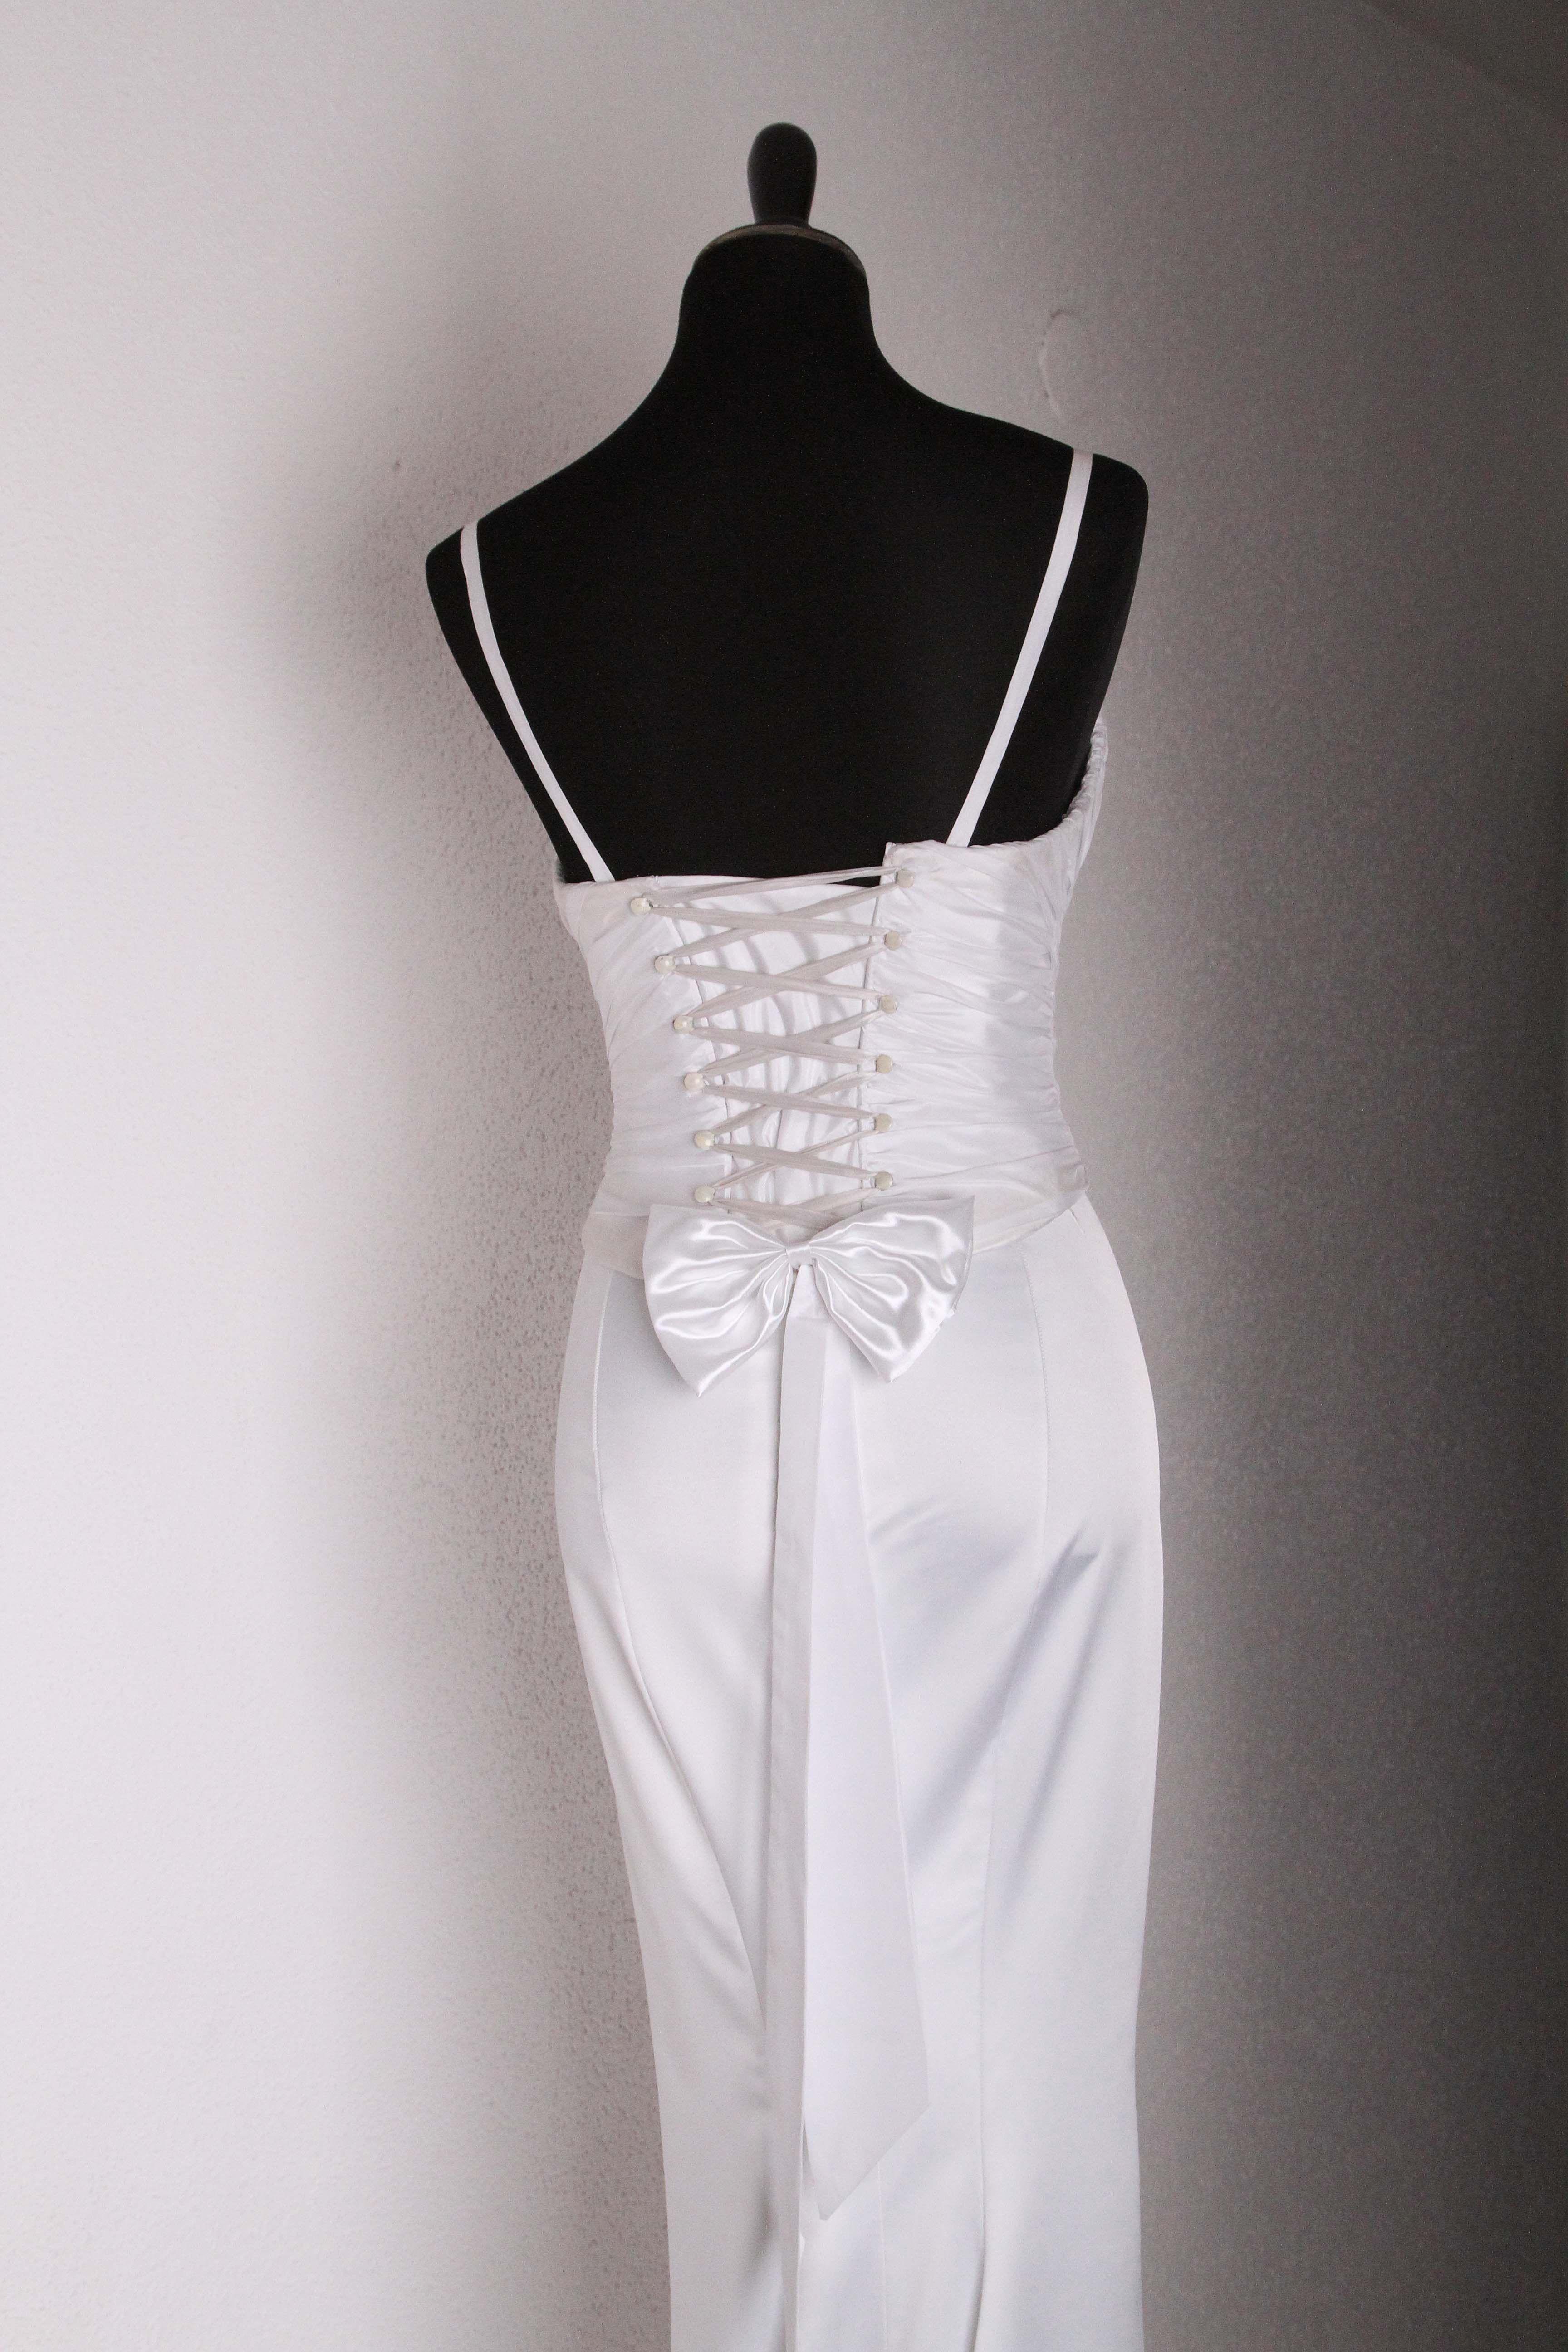 Exclusive wedding gowns of designer Victoria Falkovich. Photo: Valery Dashevsky VICTO WEDDINGS Wedding and Evening Dress fashionable design Exclusive Netanya, Israel Smilanski srt.4 0546277641, 0506847608 0773241124